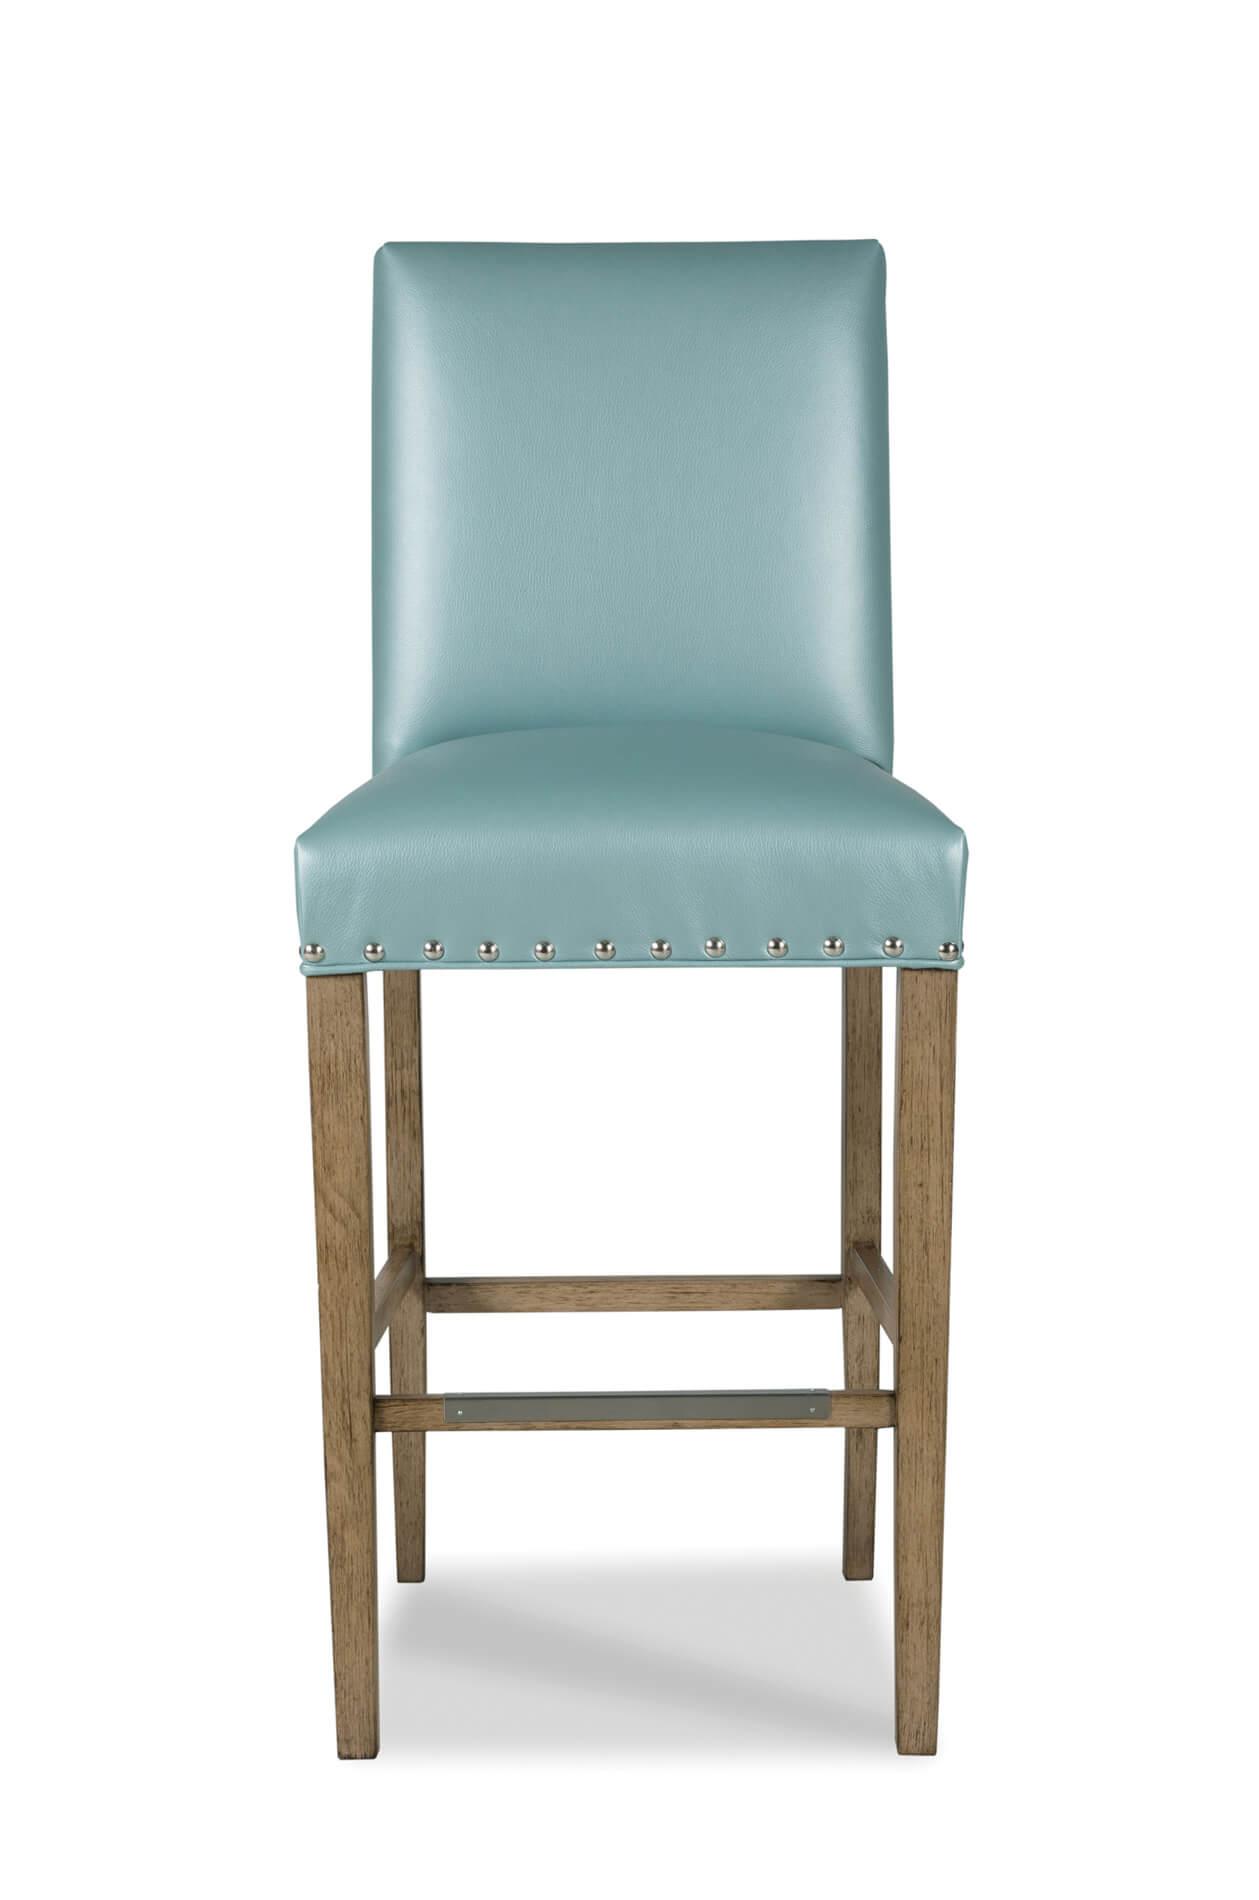 Buy Evans Upholstered Durable Wood Barstool W Back Fully Assembled